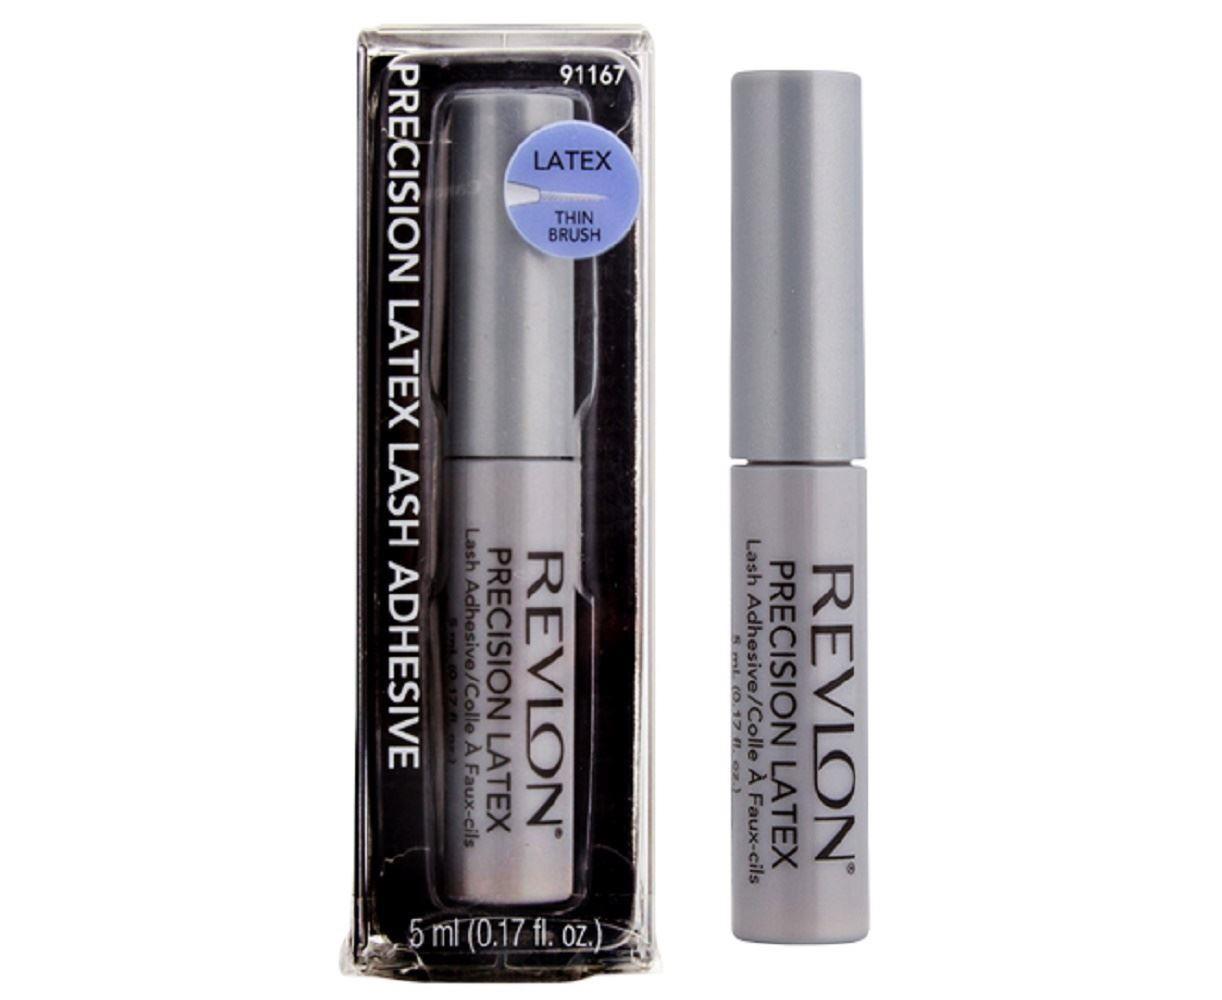 Revlon Precision Latex Waterproof Lash Glue, Clear